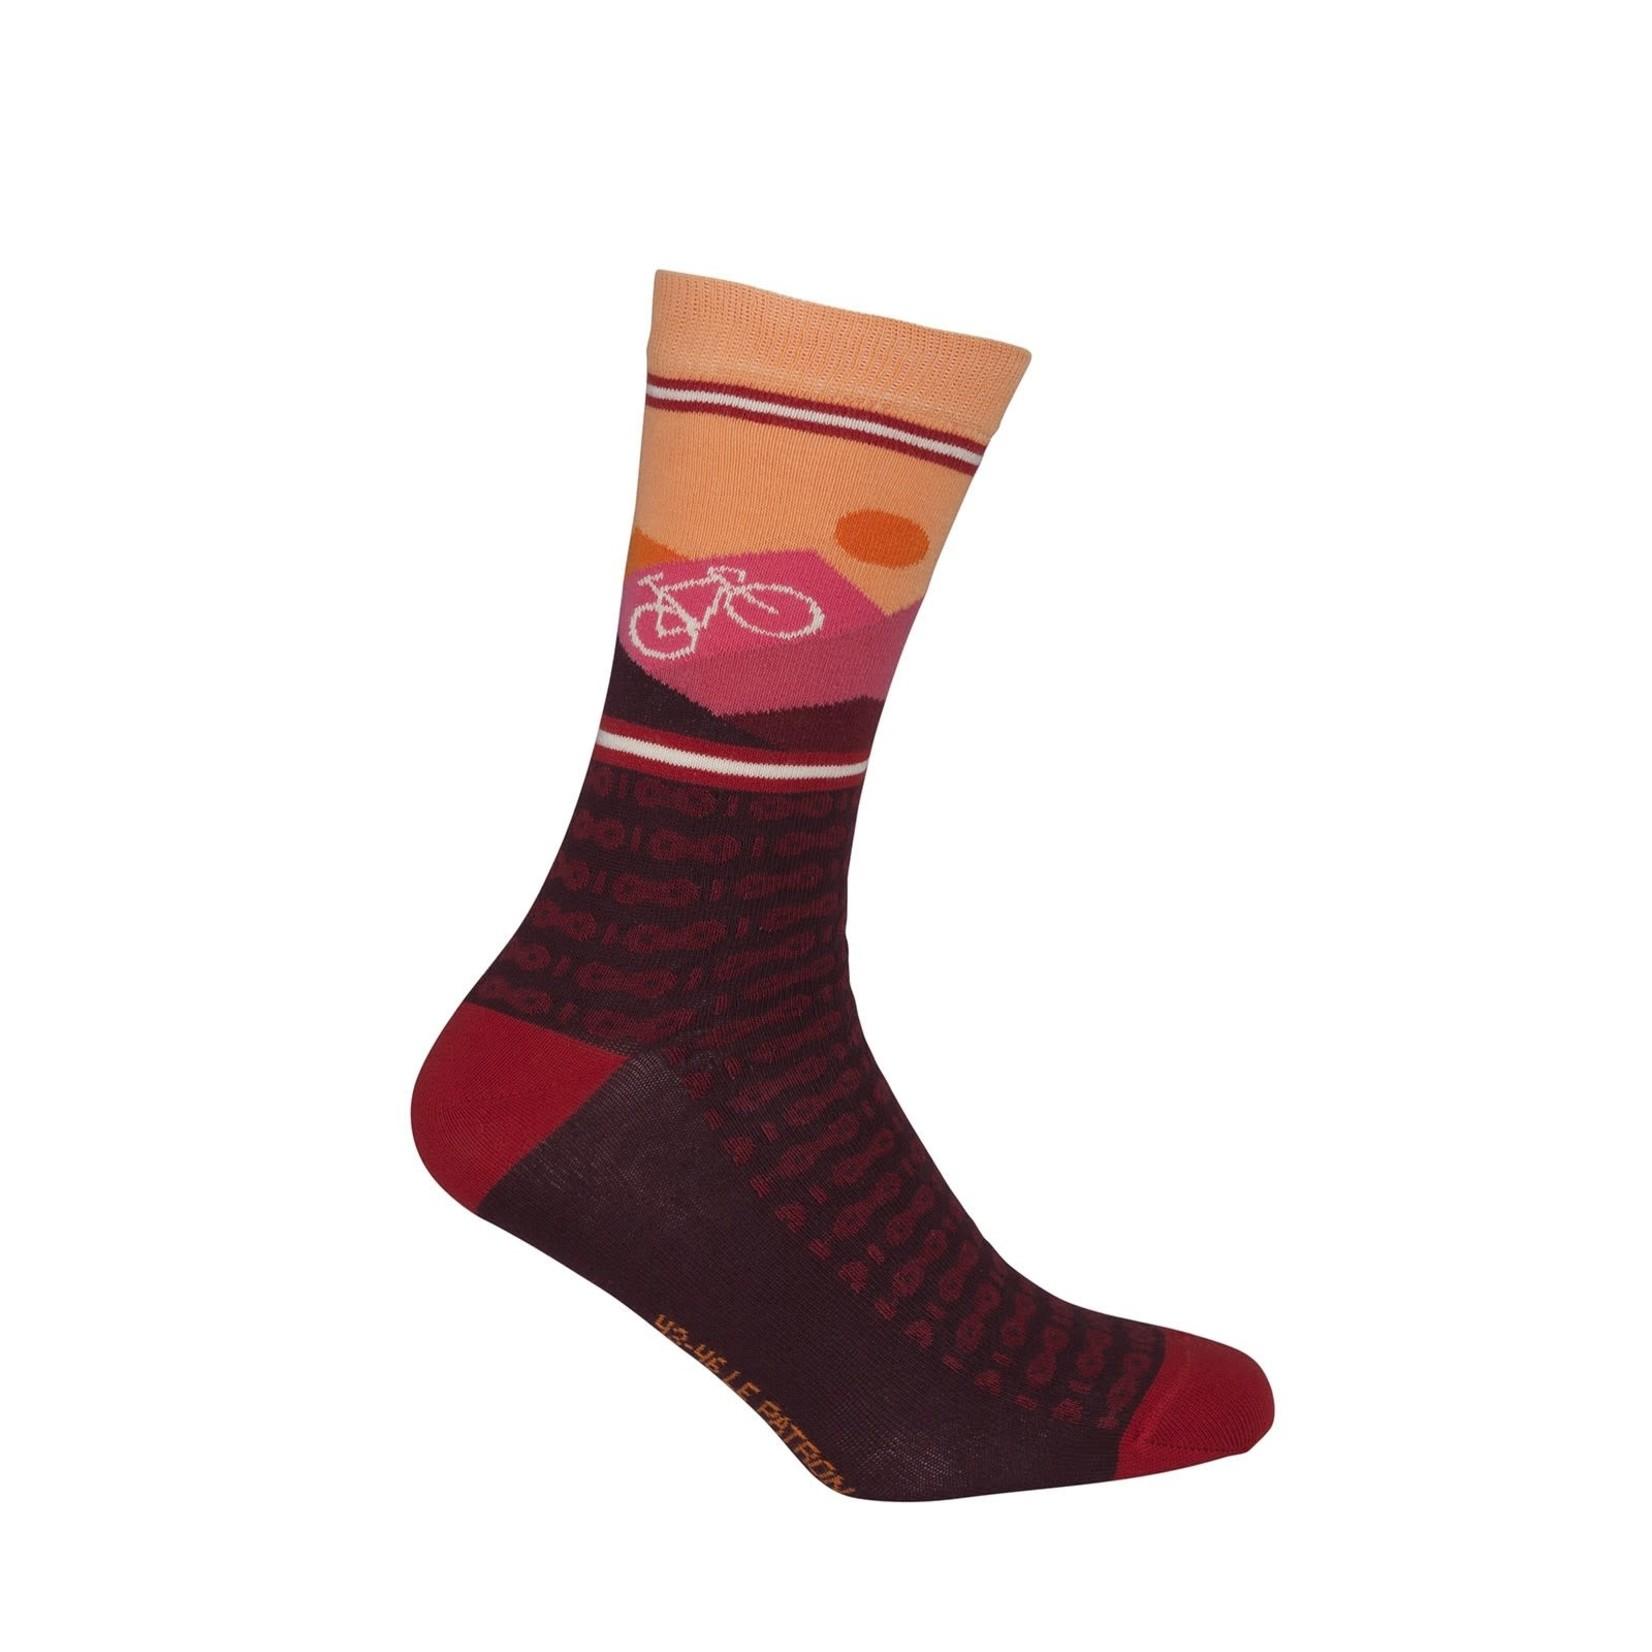 Sokken 'Le Patron' Mountain socks bordeaux